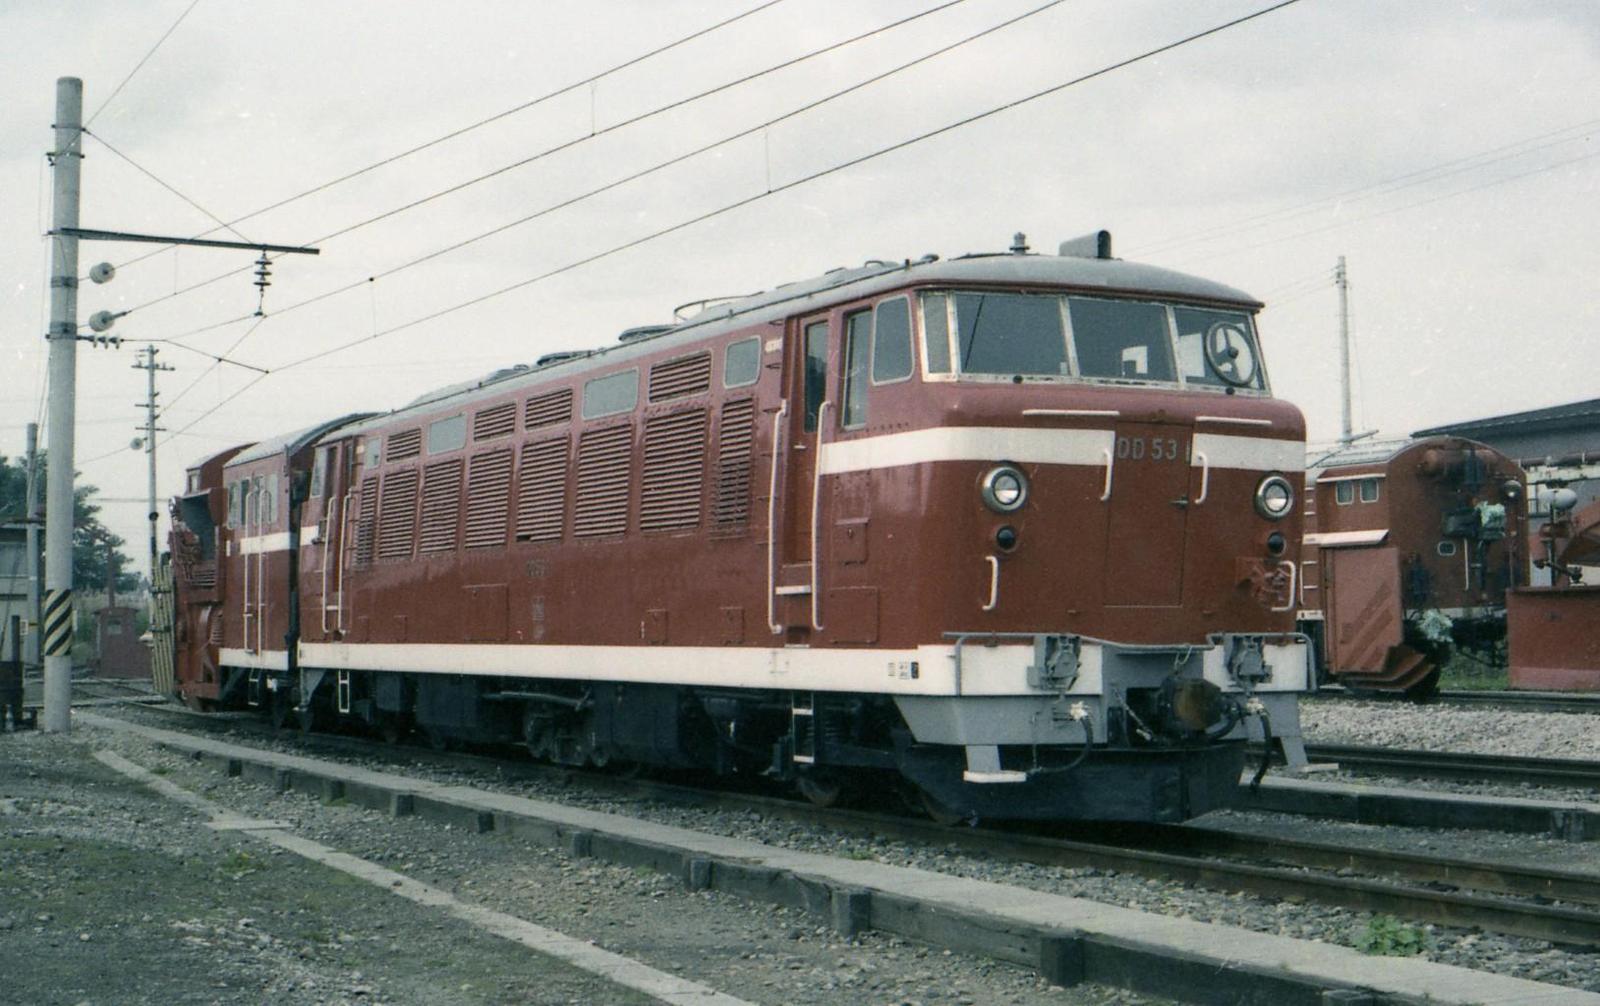 197810051122